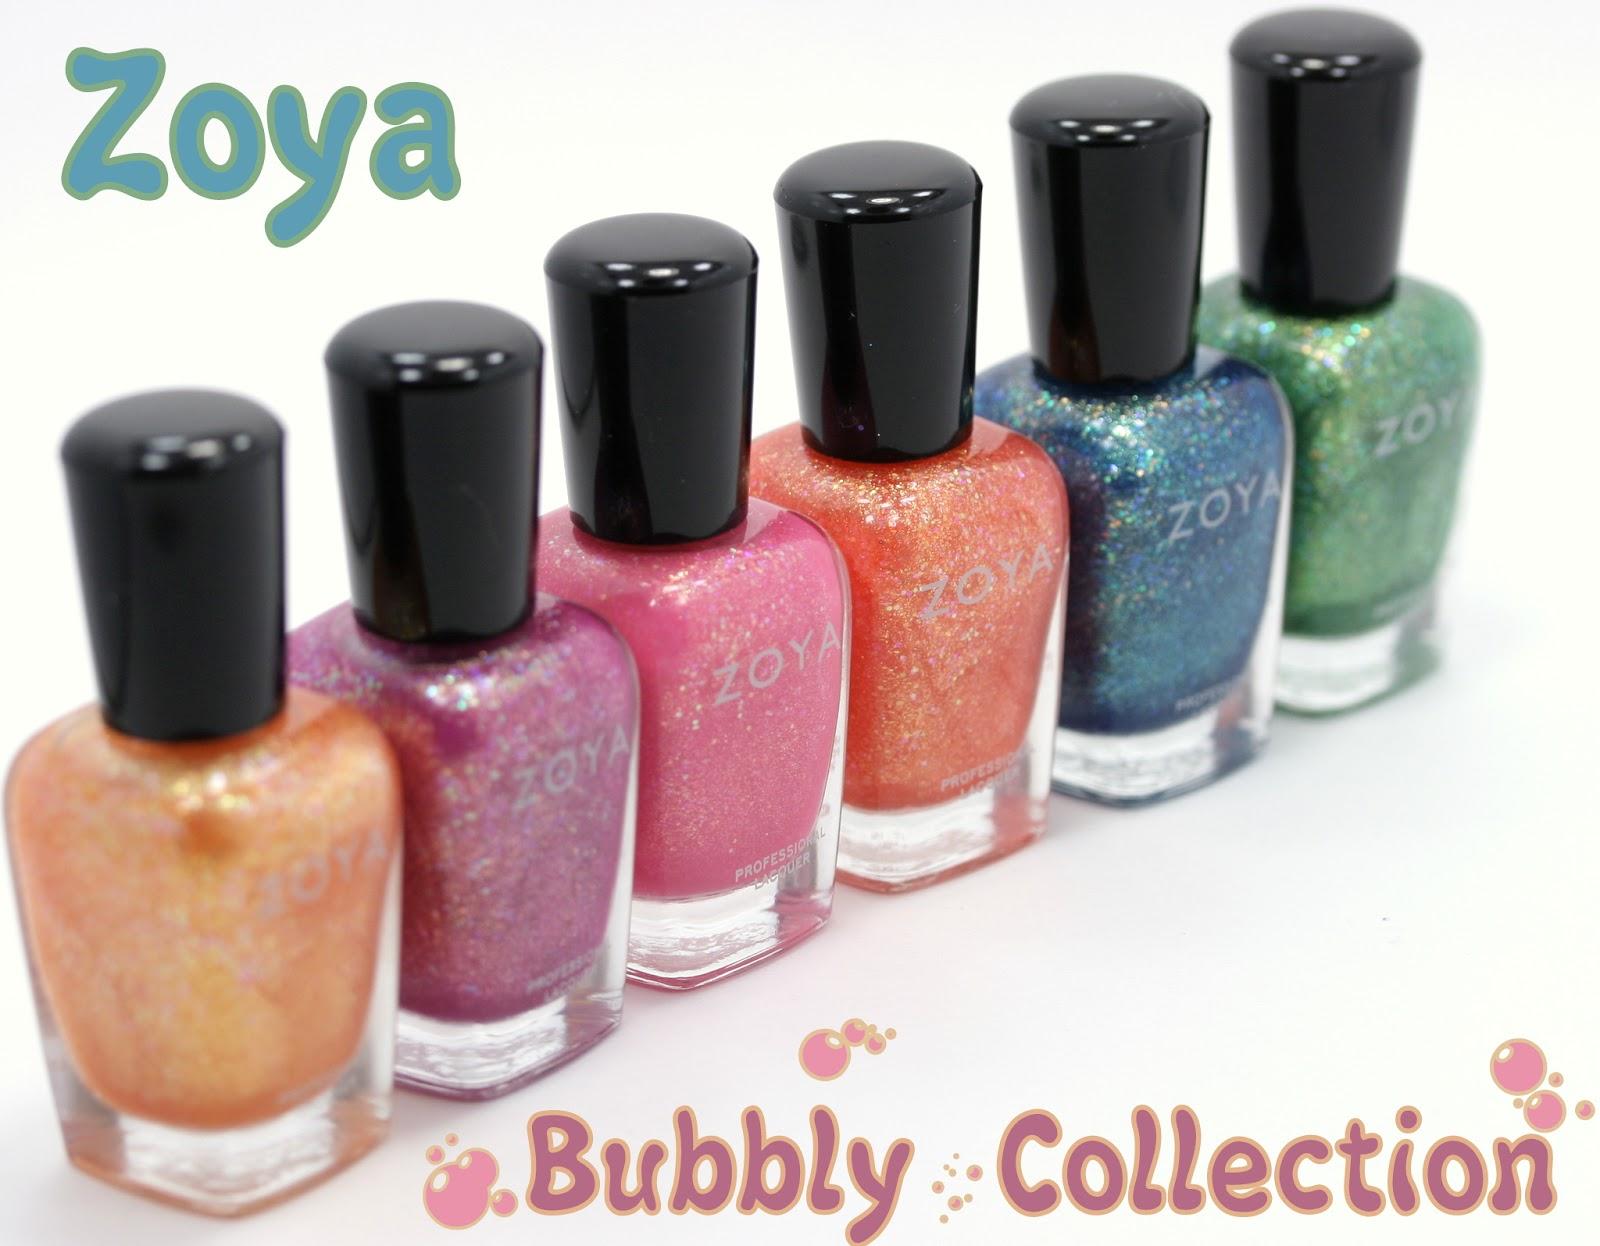 Zoya Bubbly Collection